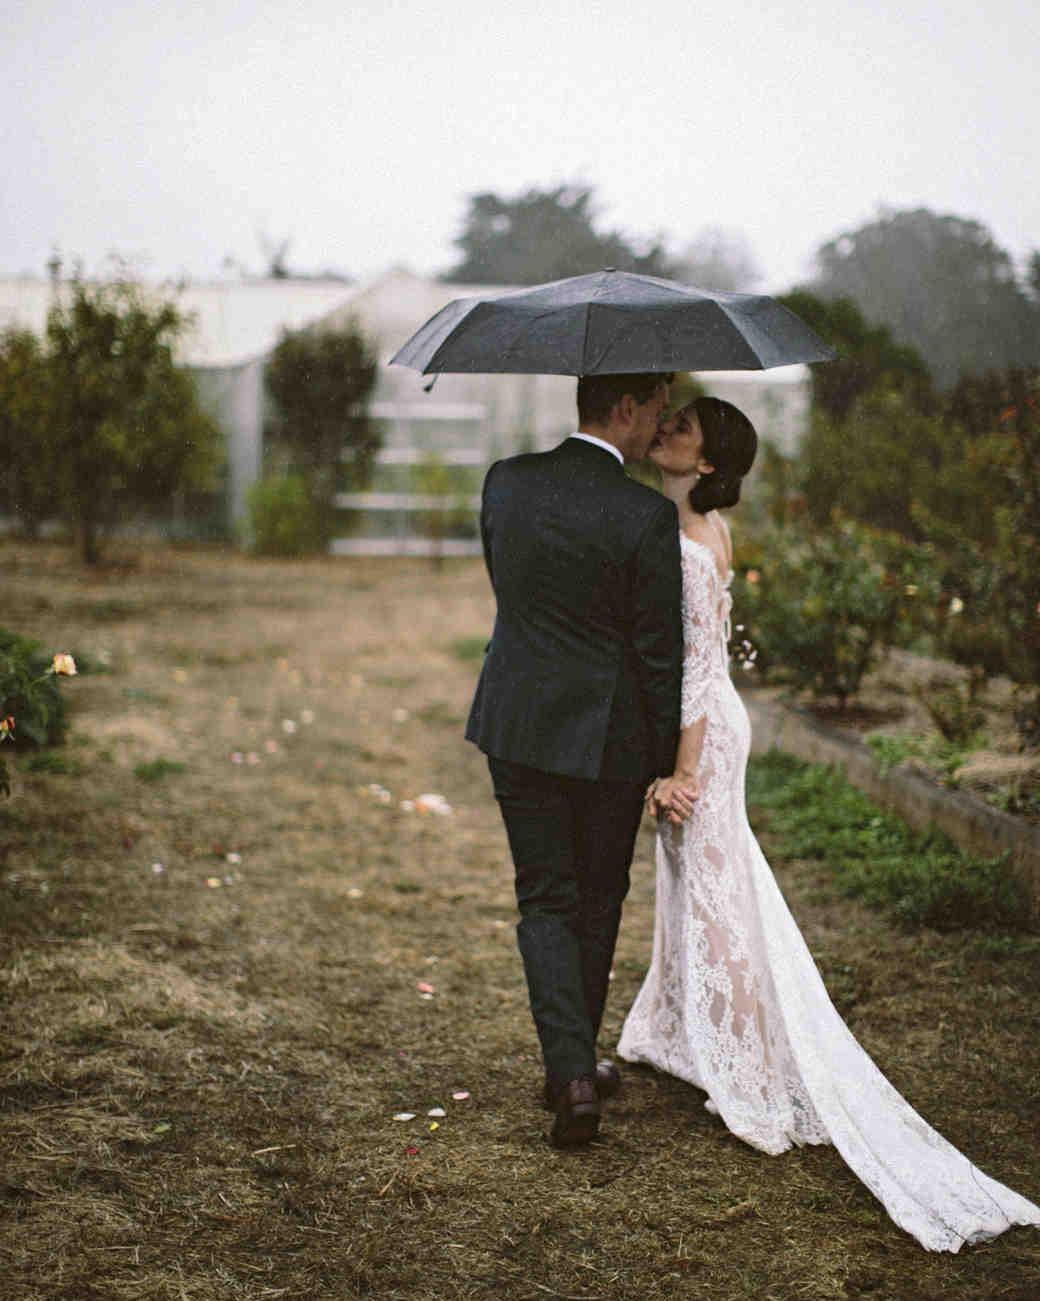 rainy wedding bride and groom kissing with umbrella